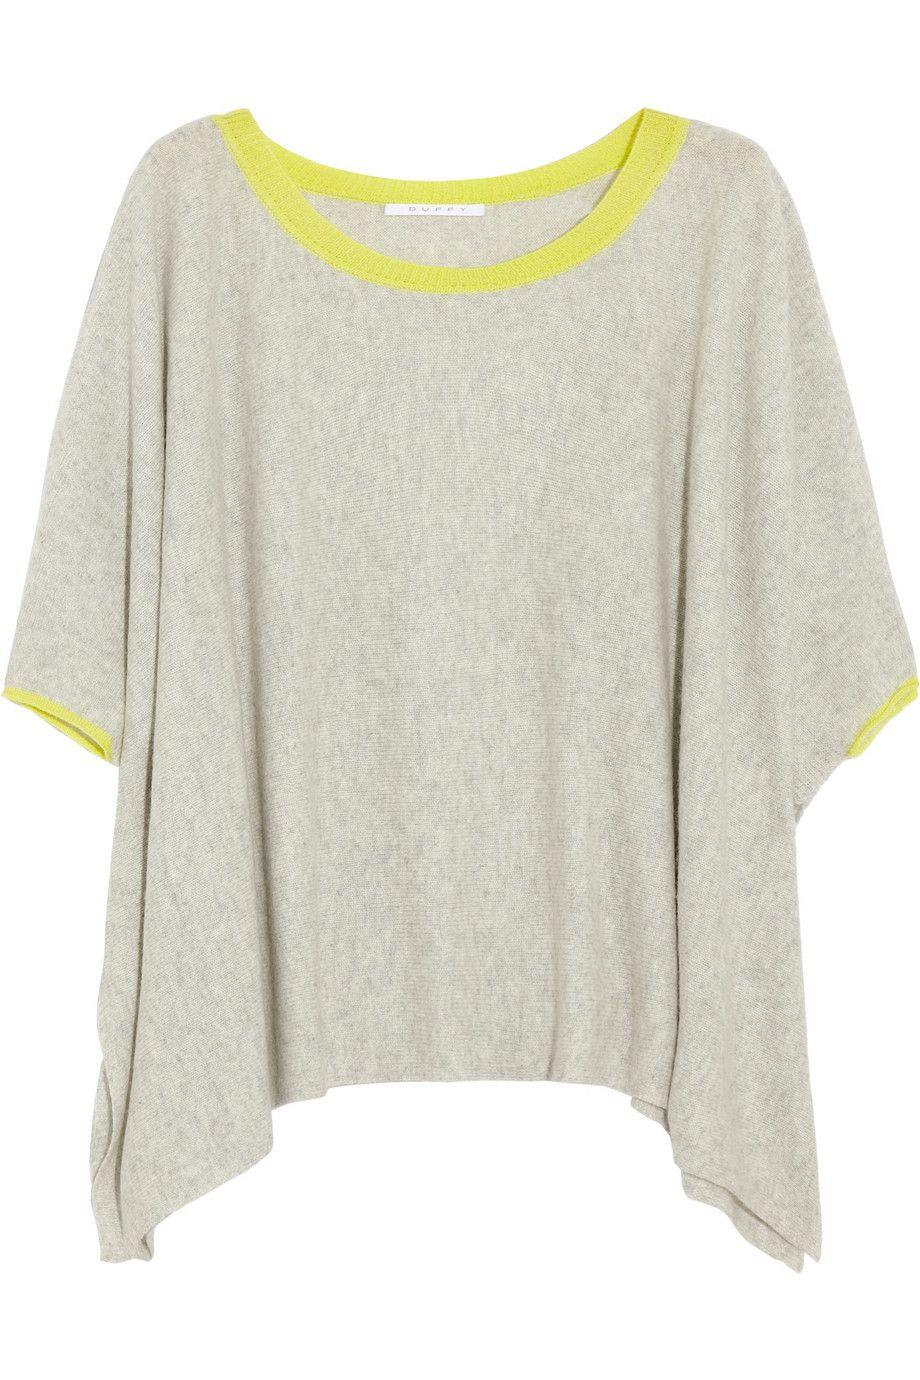 Recortada Neon suéter de cachemira cubierto por Duffy